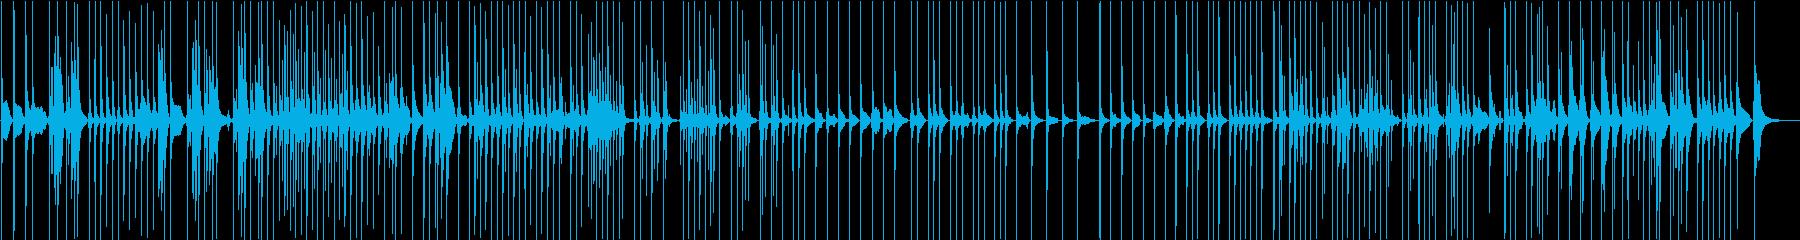 三味線165花見踊5合方元禄酒飲み会宴会の再生済みの波形